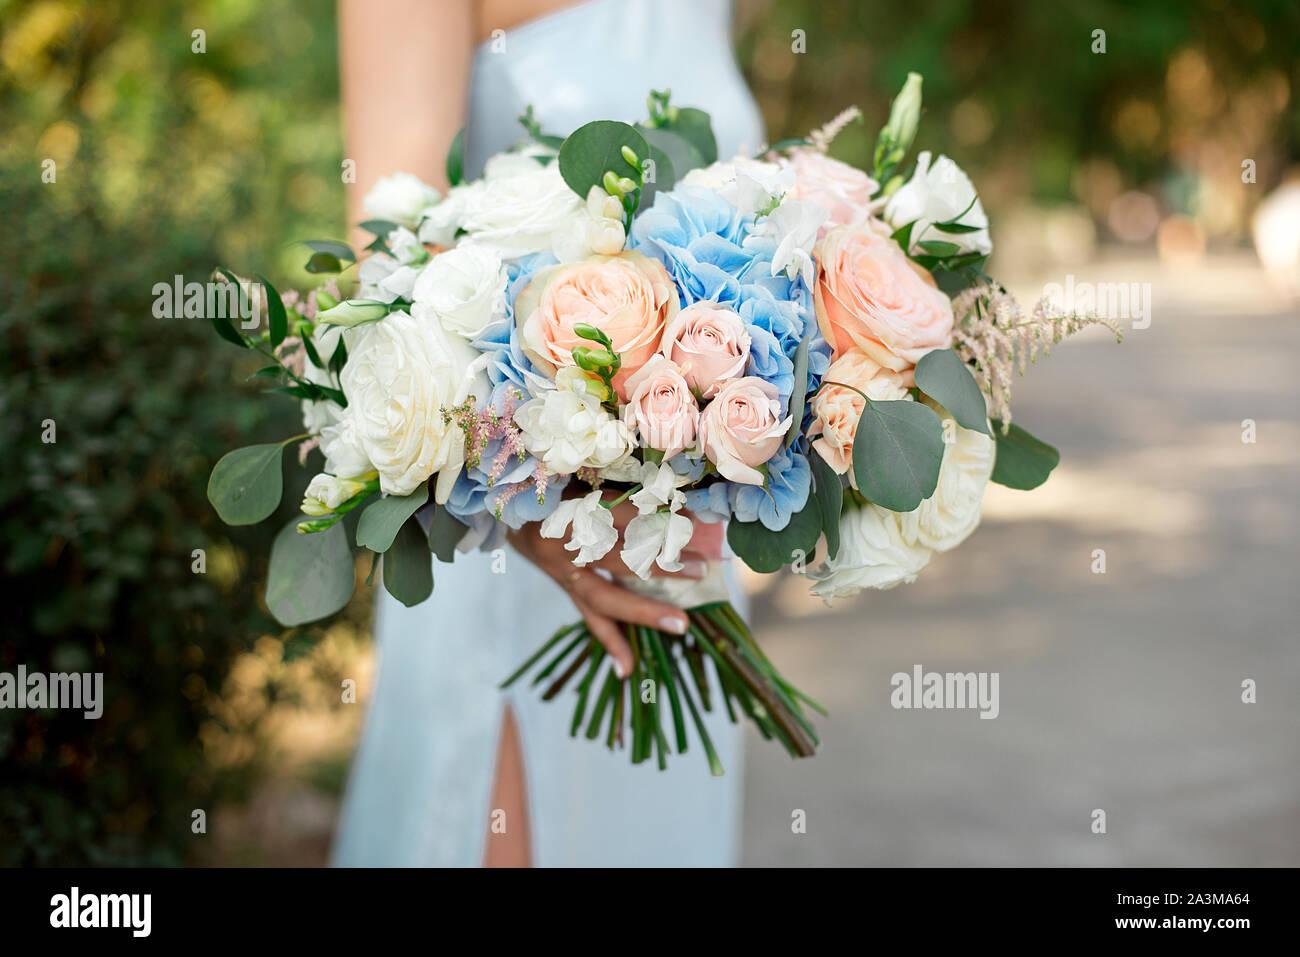 Girl holds in her hands a gorgeous bouquet of roses, hydrangeas, ozotamnus, hypericum, eucalyptus Stock Photo